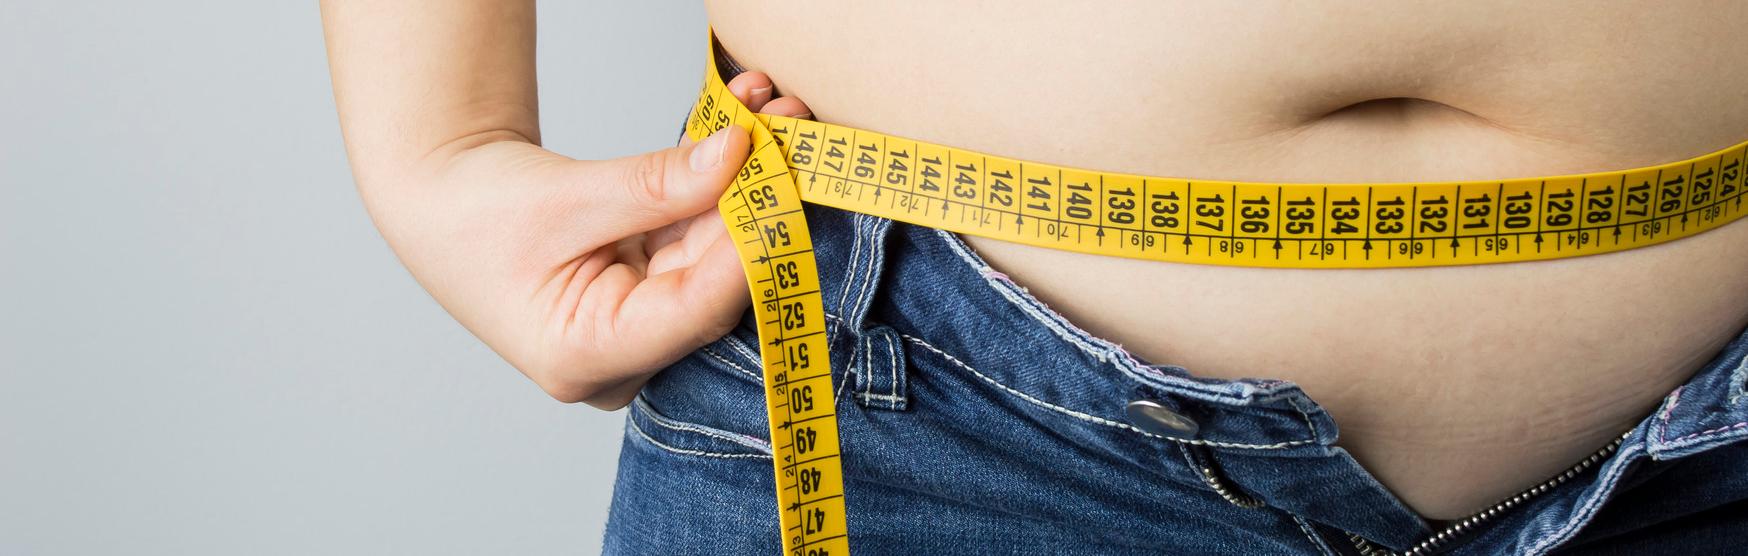 rapid weight gain treatment